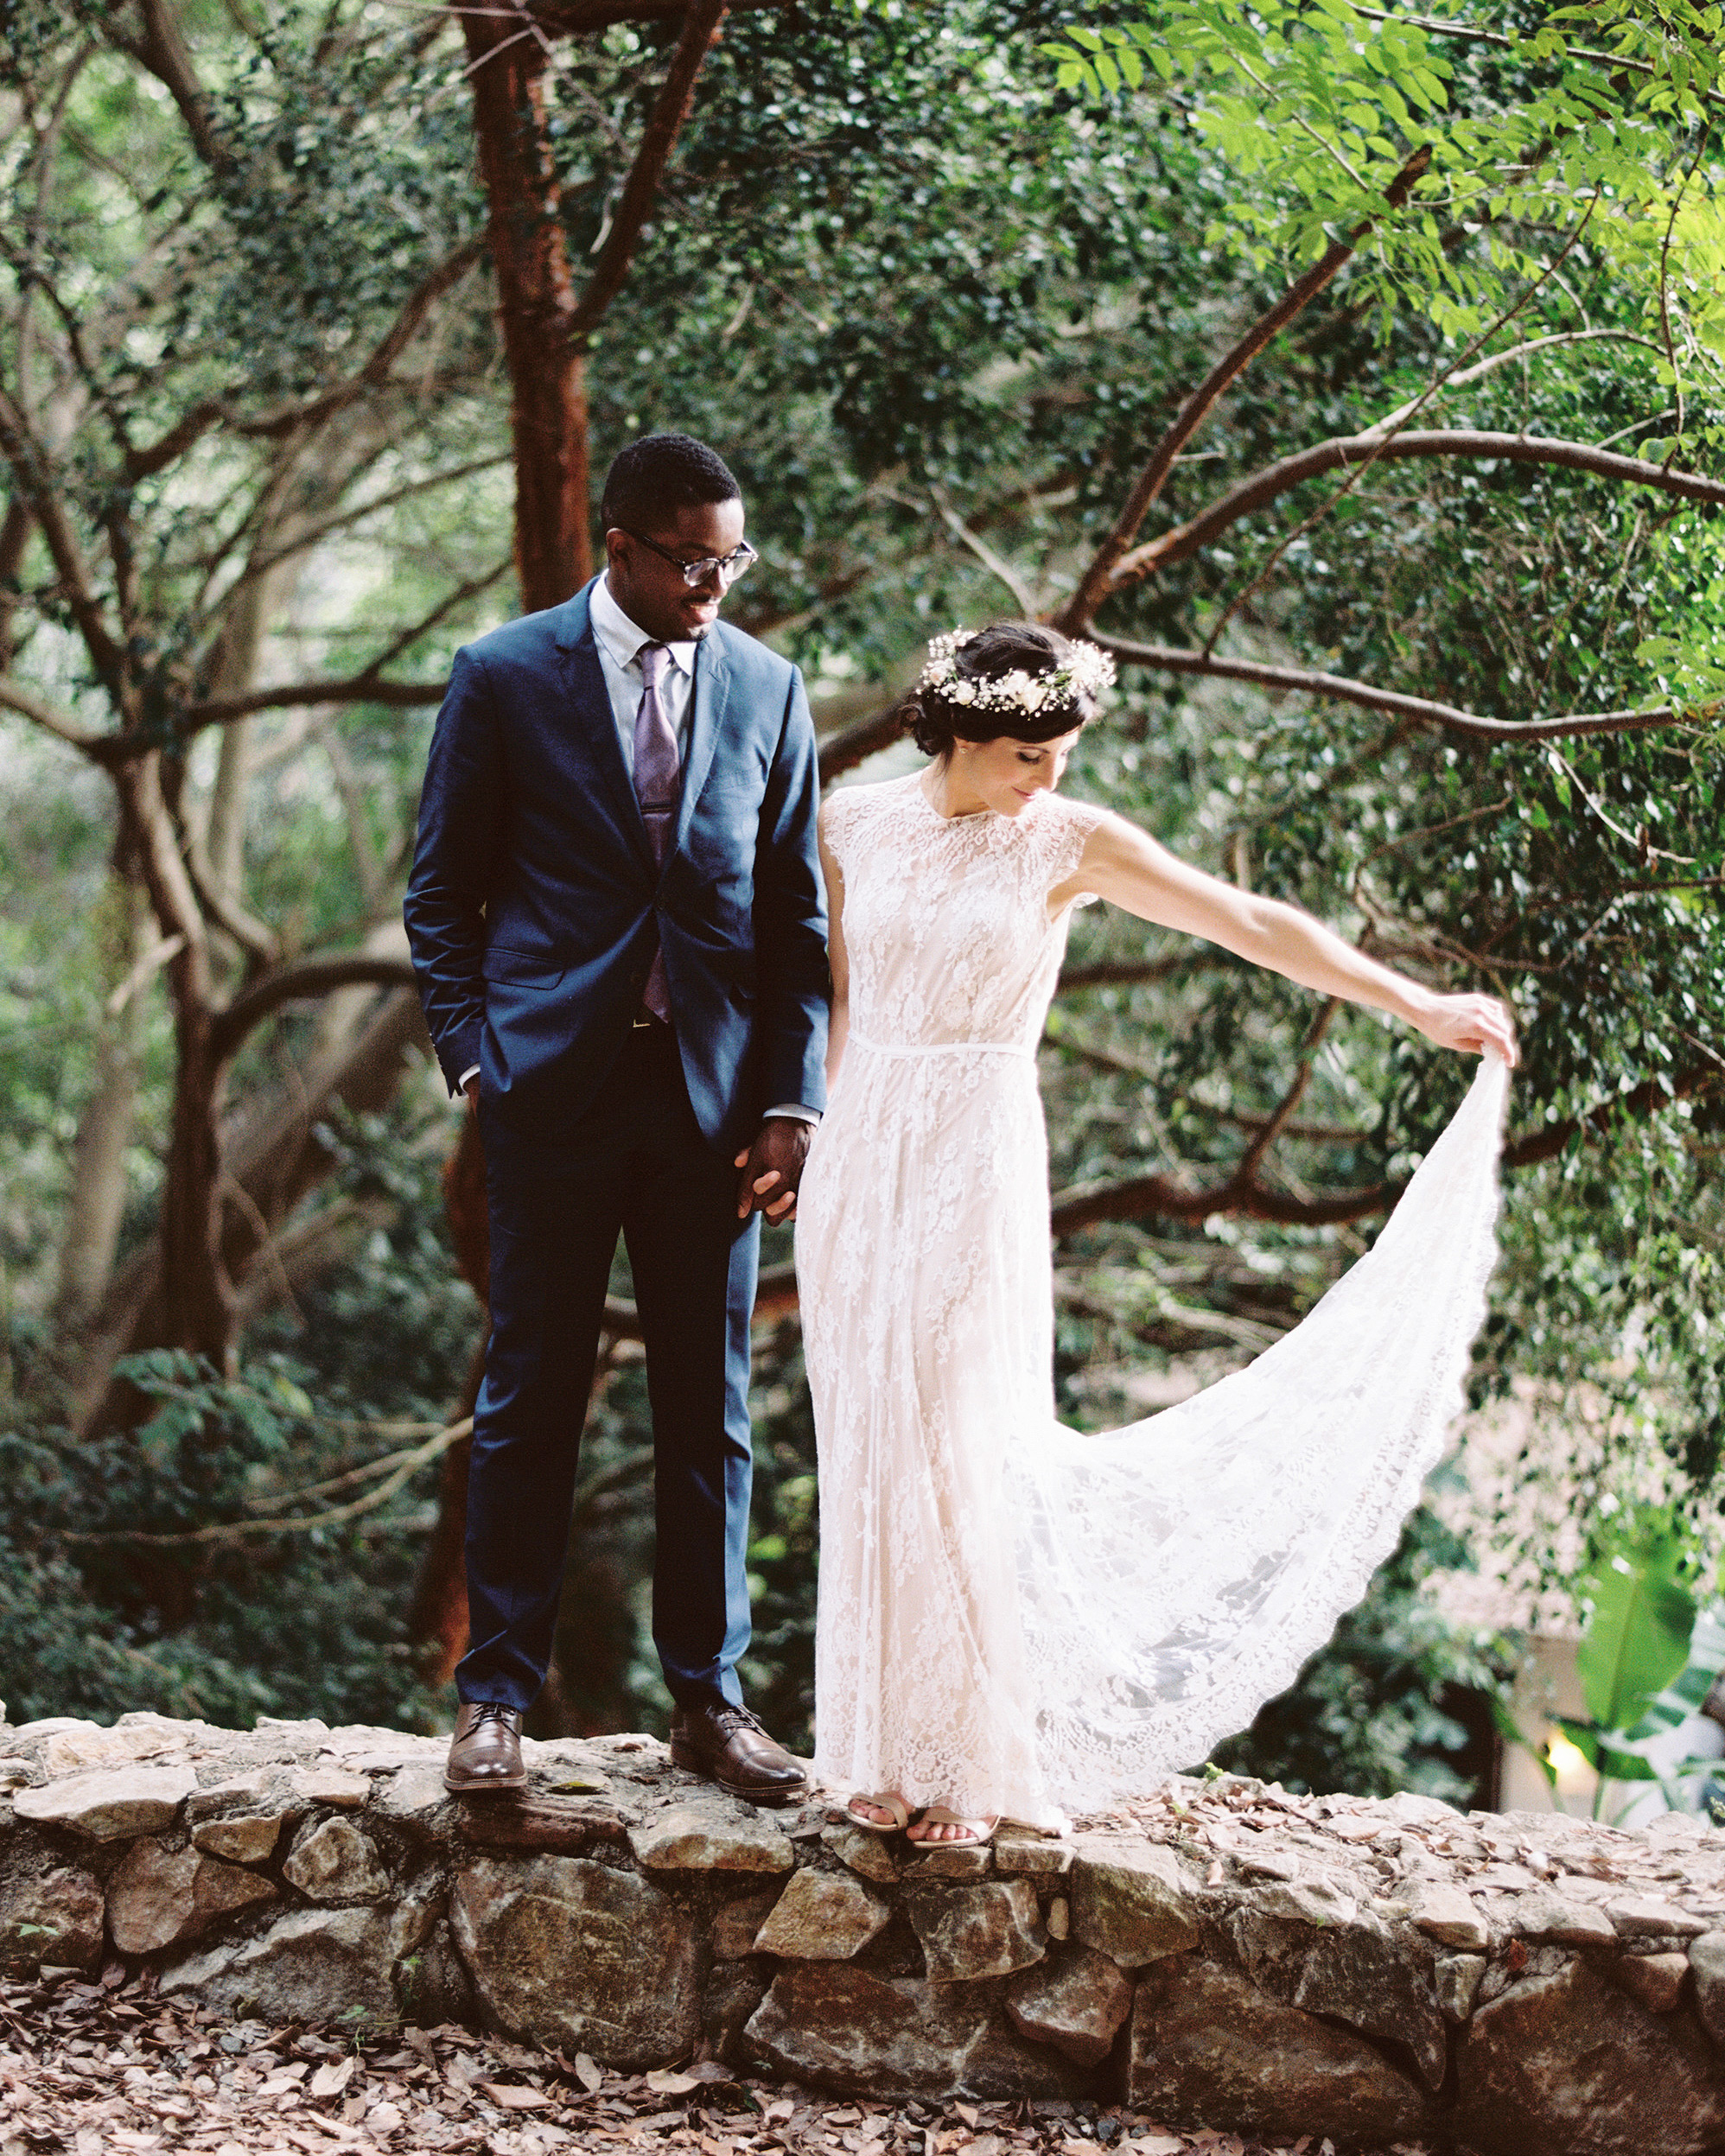 rebecca-eji-wedding-couple-245-s113057-0616.jpg